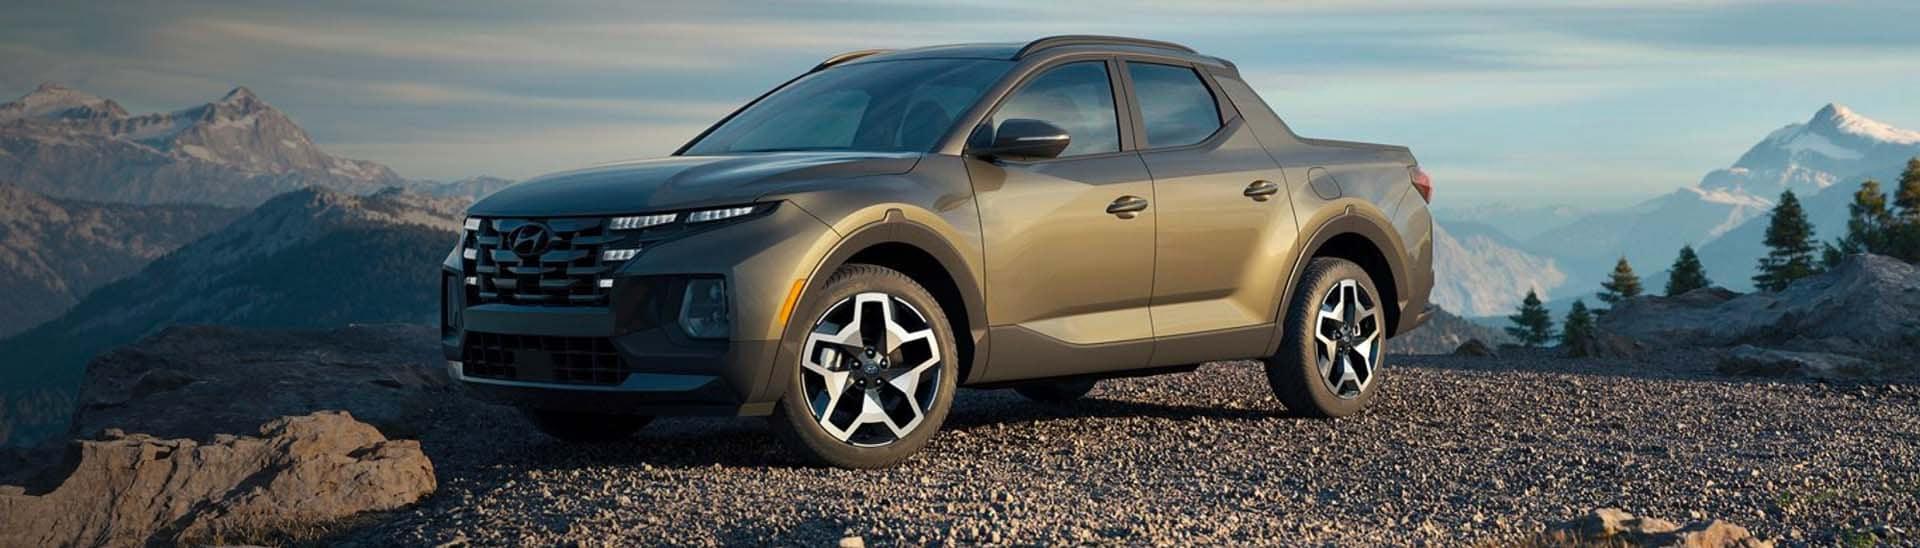 2022 Hyundai Santa Cruz in the color Sage Grey on a mountain top.